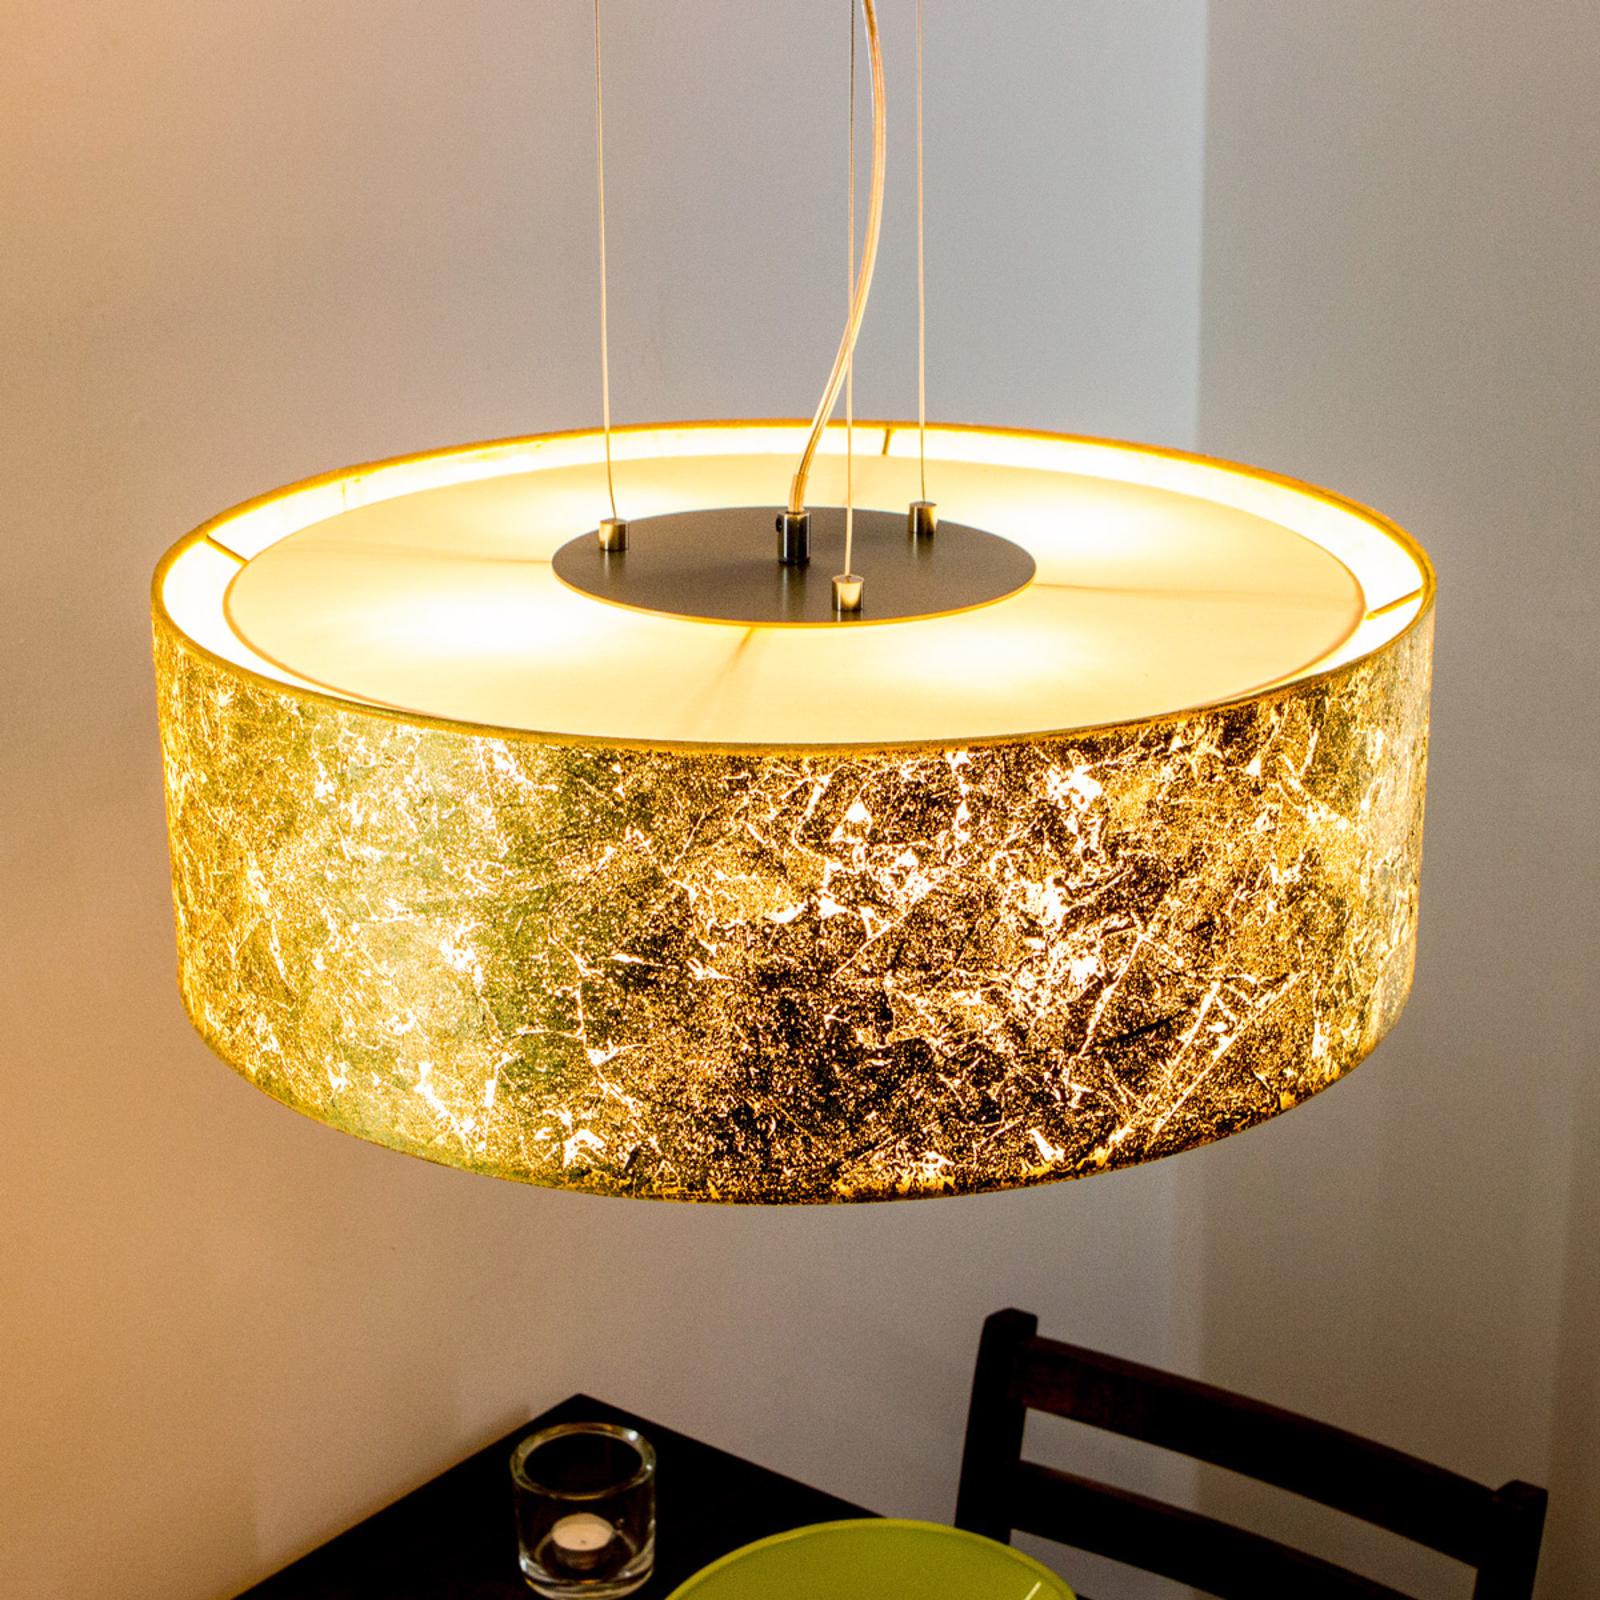 Gyllen pendellampe Aura - Made in Germany